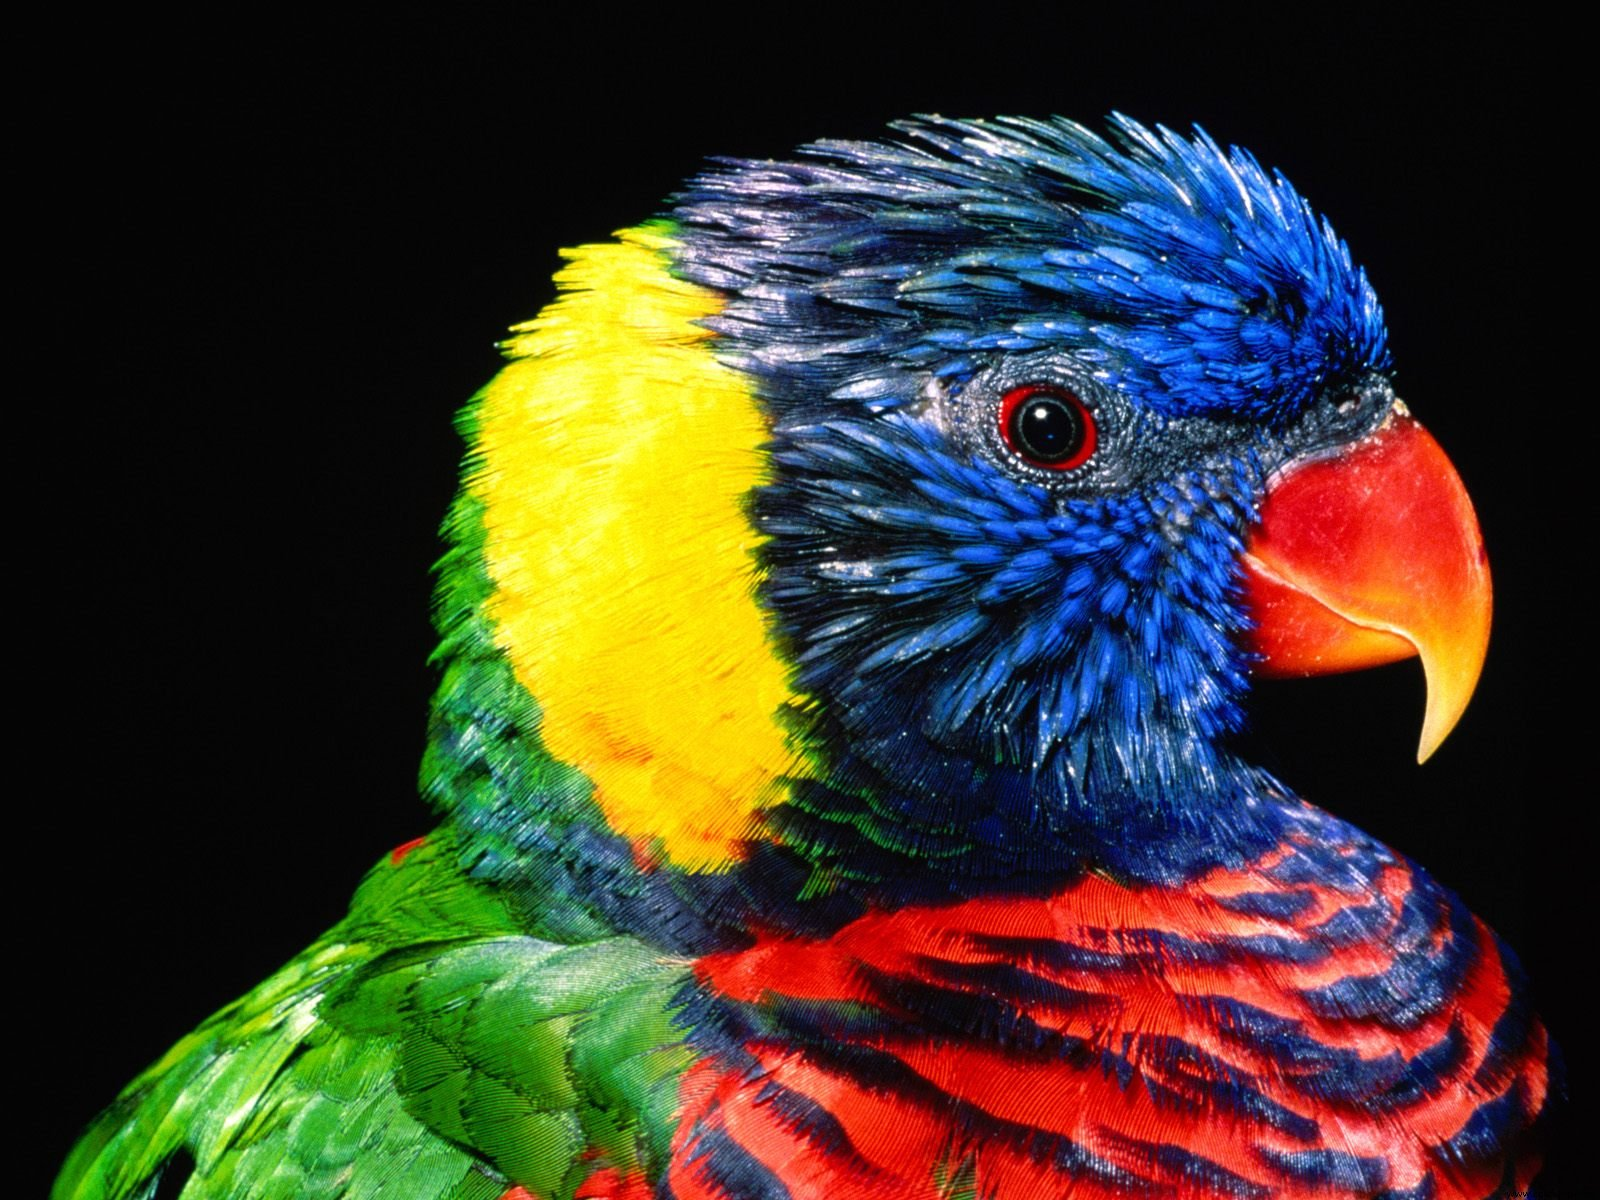 parrots wallpaper bird - photo #27